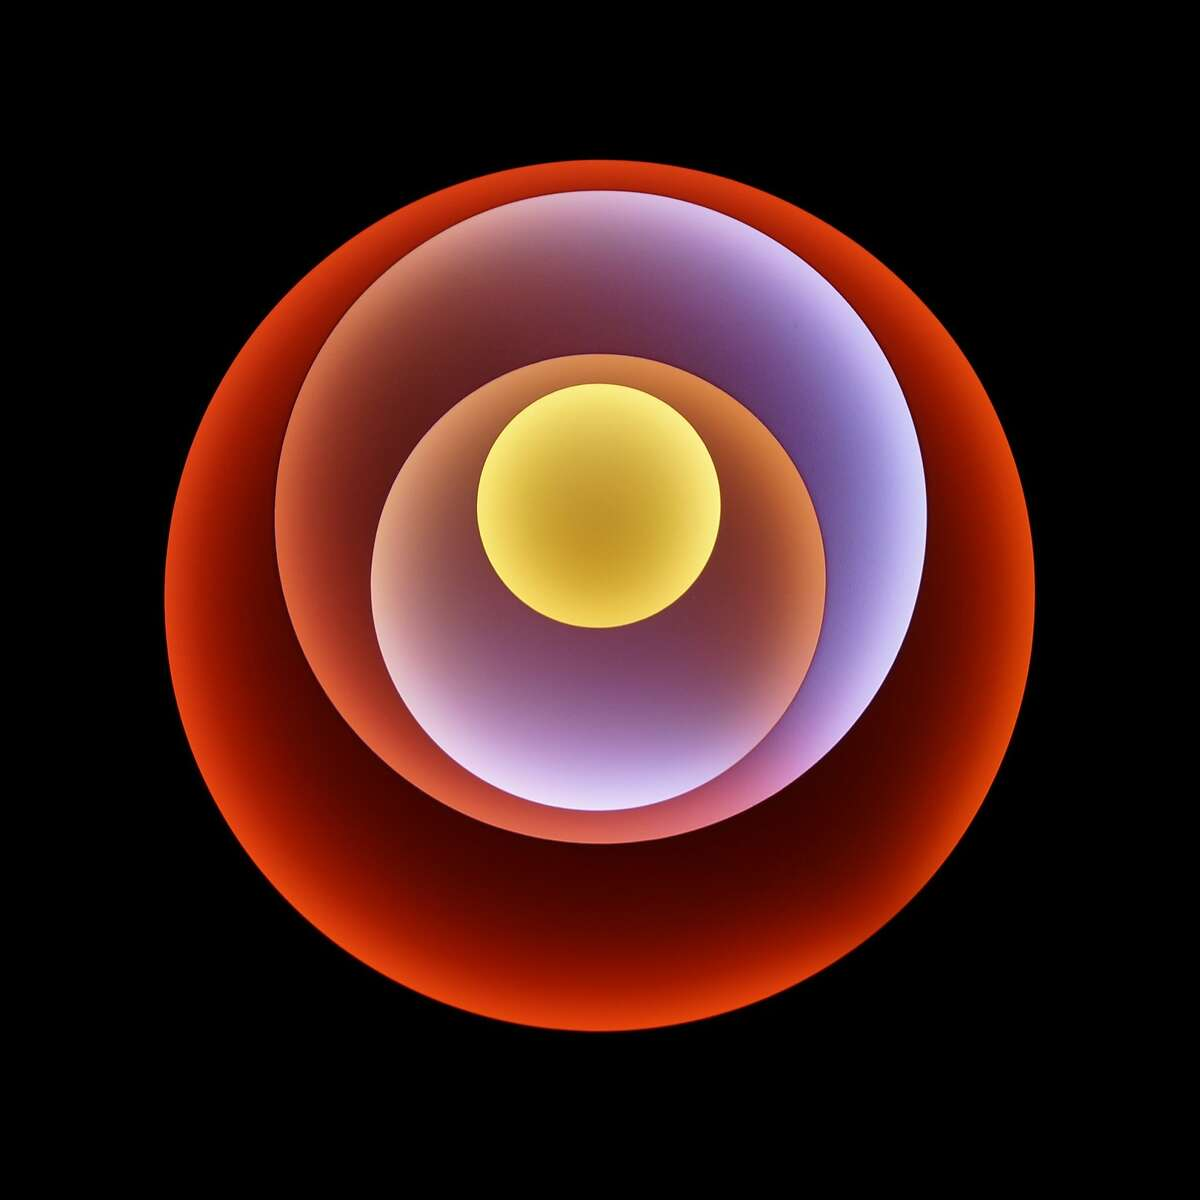 Offset_Circles -- medium -- Fruits and Vegetables Dimensions: 16